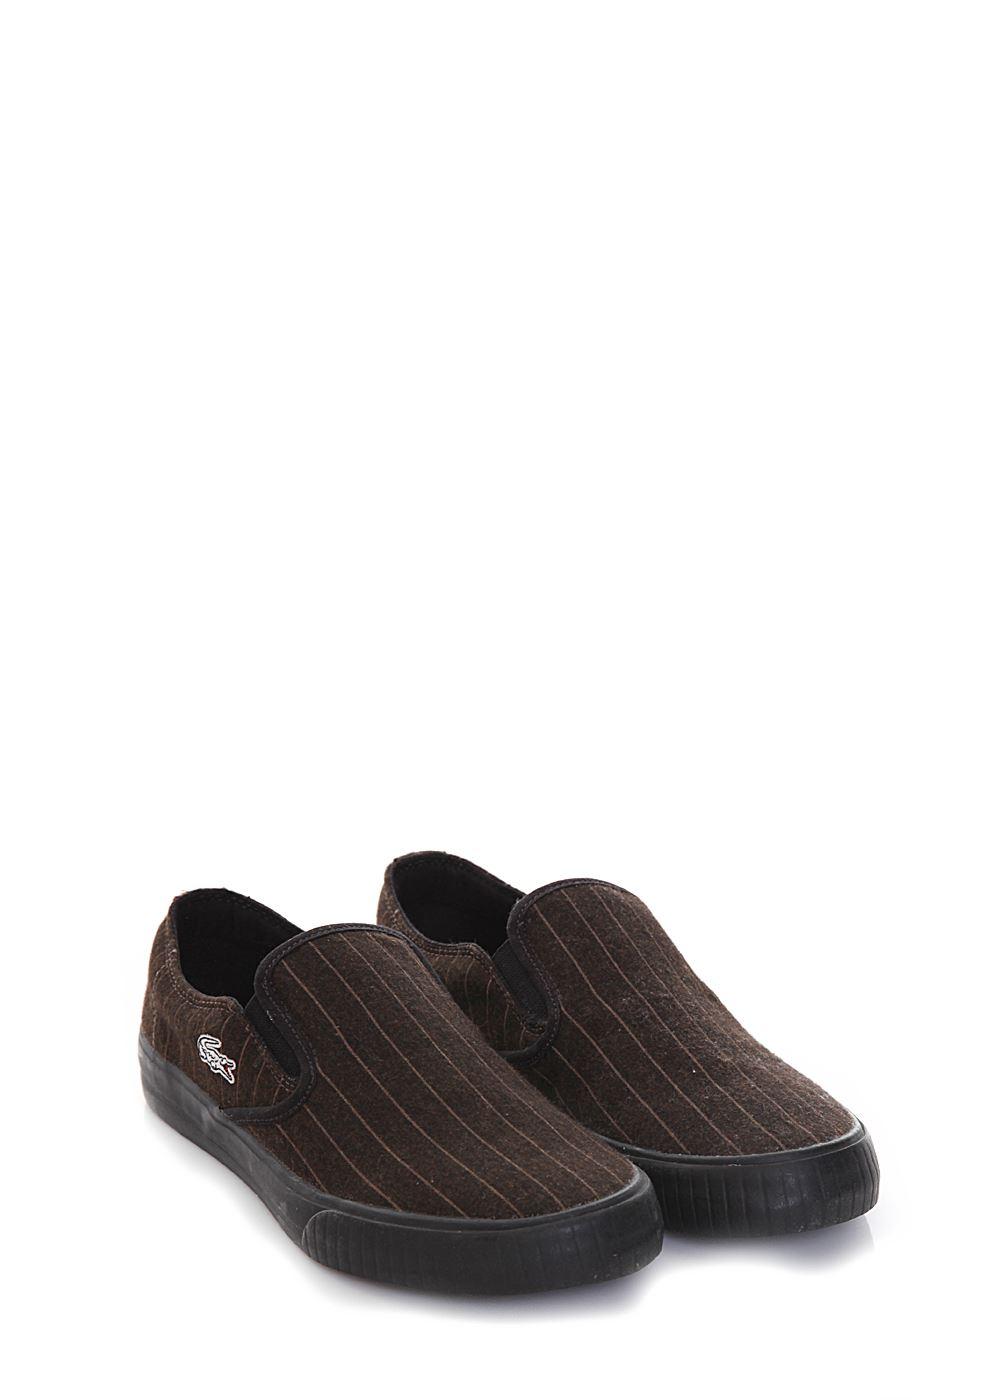 Walking Style - Ανδρικά Παπούτσια LACOSTE